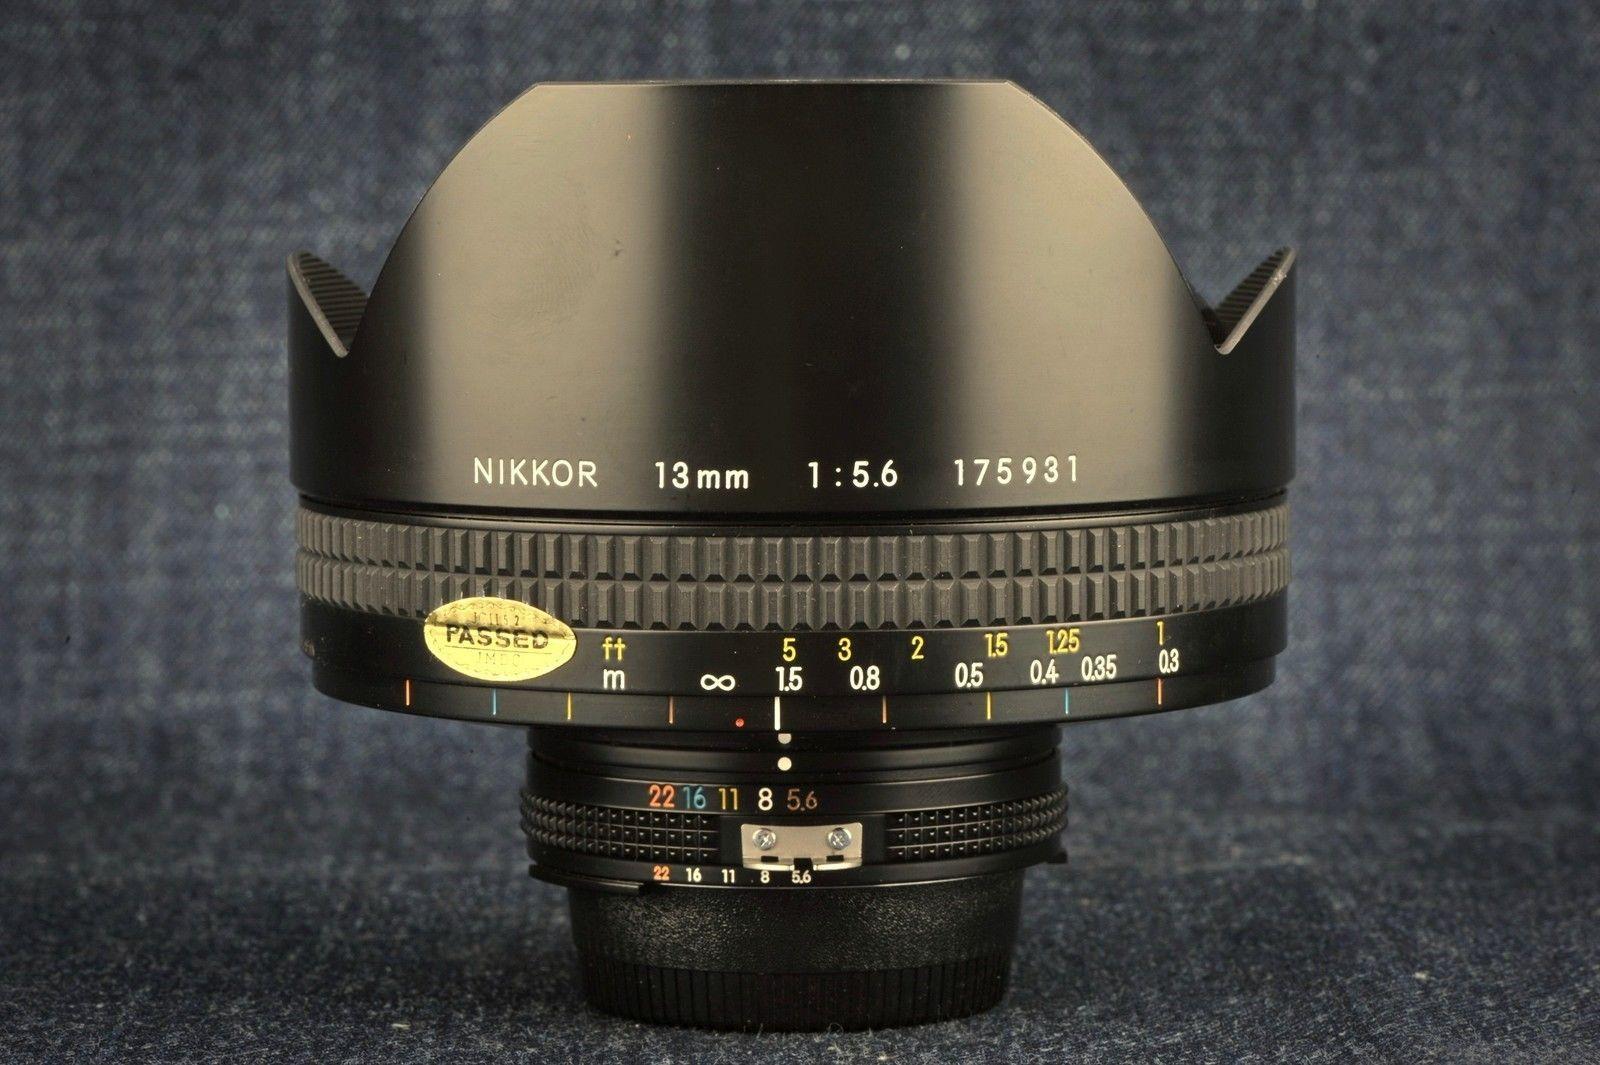 Details about [ MINT IN BOX ] Nikon Ai-S Ais Nikkor 35mm F